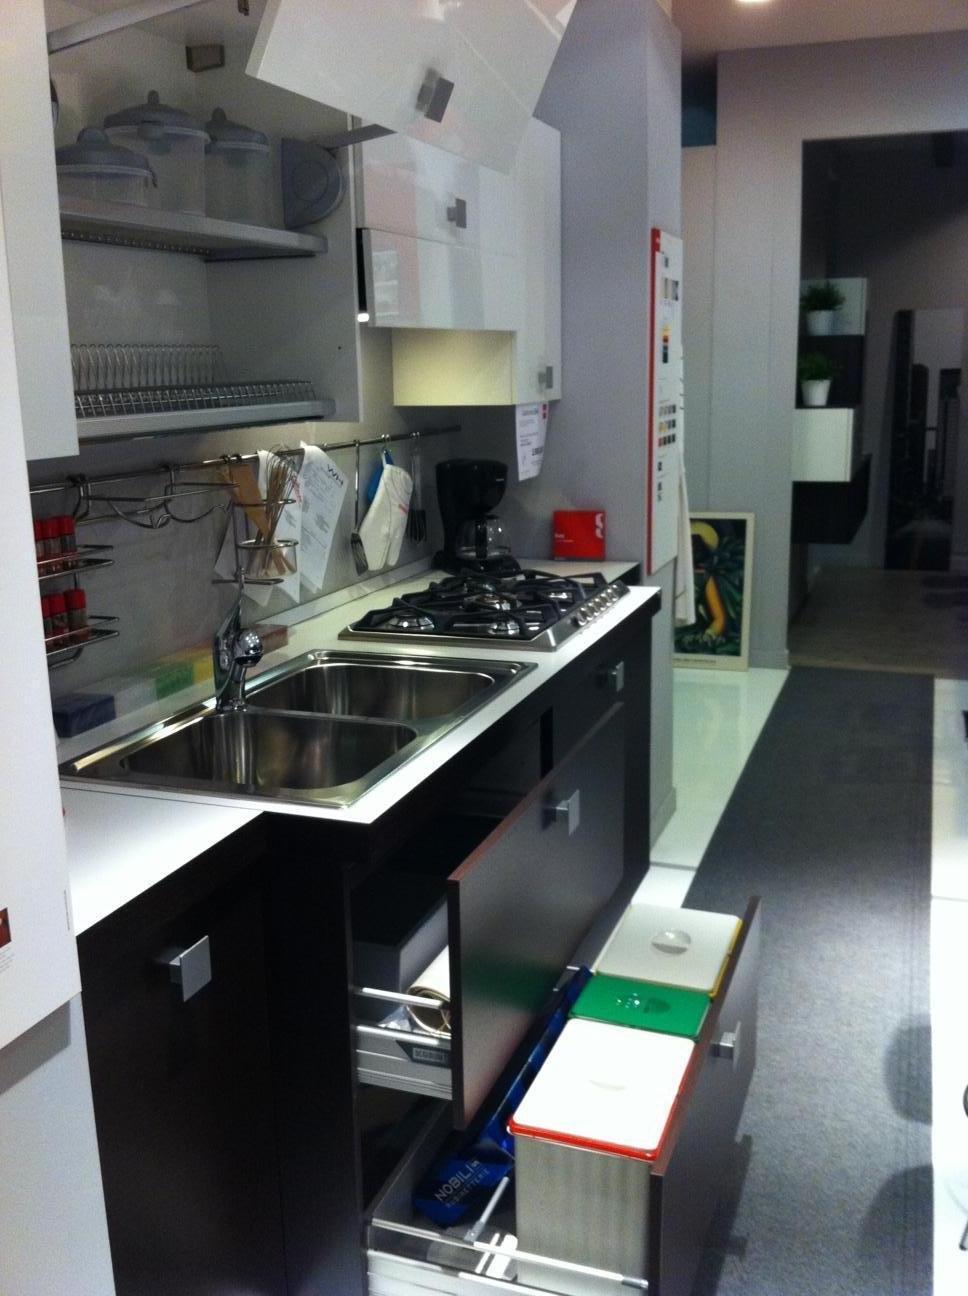 Emejing Cucina Scavolini Modello Sax Gallery - Skilifts.us ...